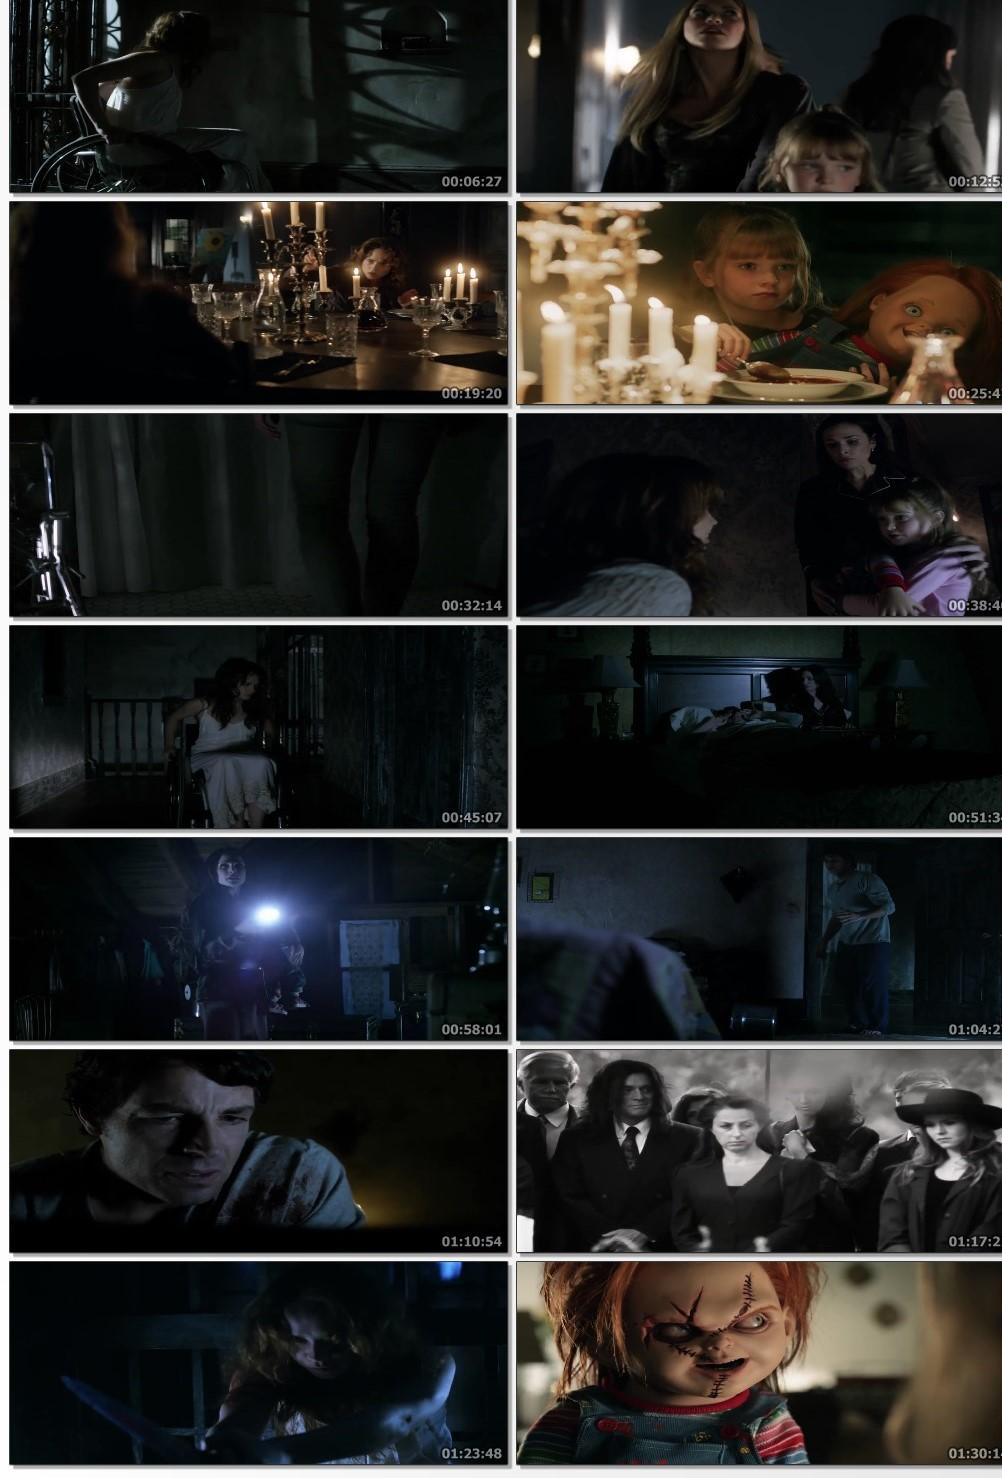 Curse-of-Chucky-2013-s-Hindi-Dual-Audio-720p-Blu-Ray-ESub-700-MB-mkv-thumbs88597a5eec77df57